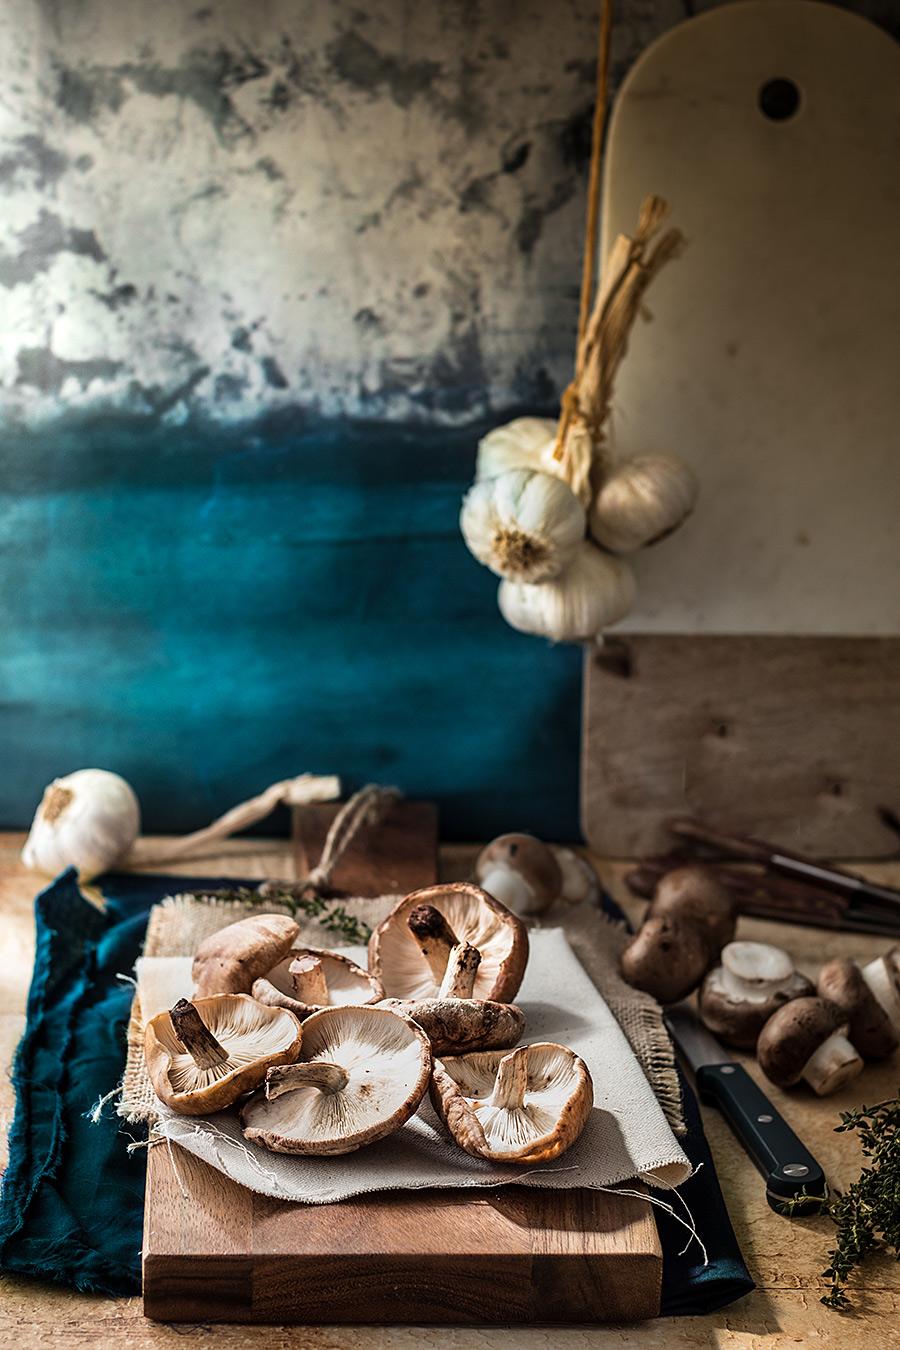 Mushrooms by Laura Domingo